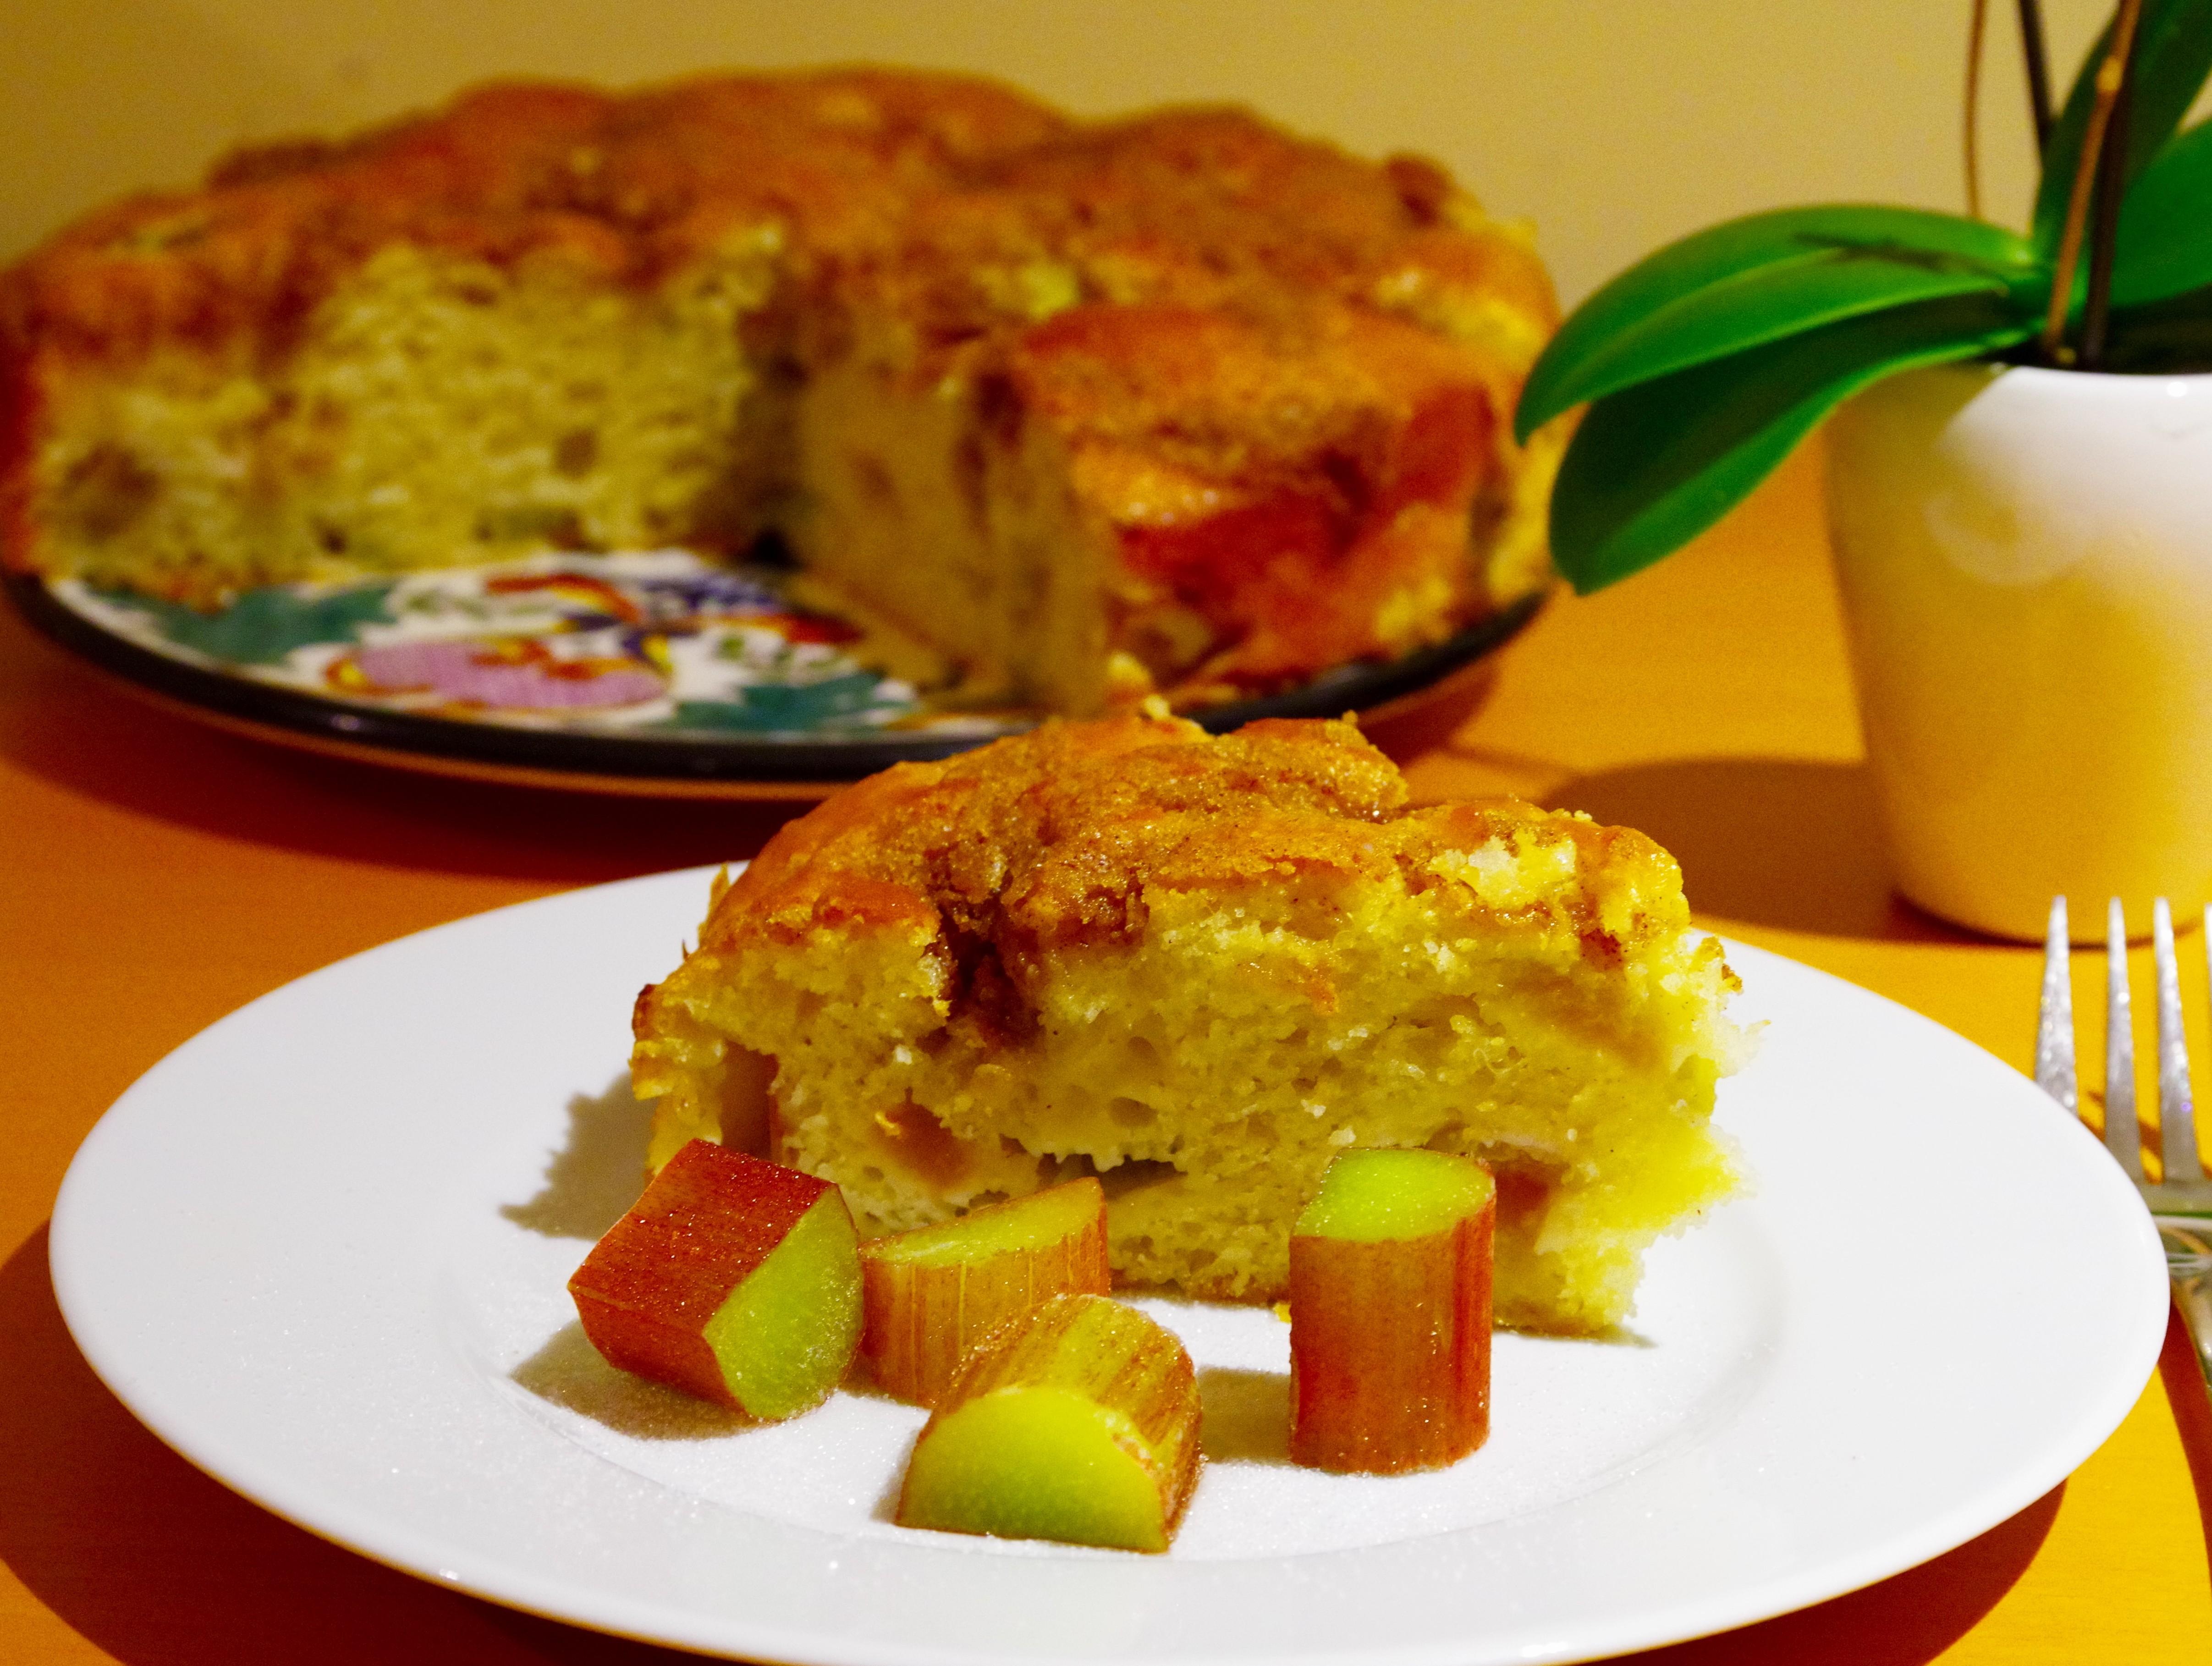 Best rhubarb cake ever!